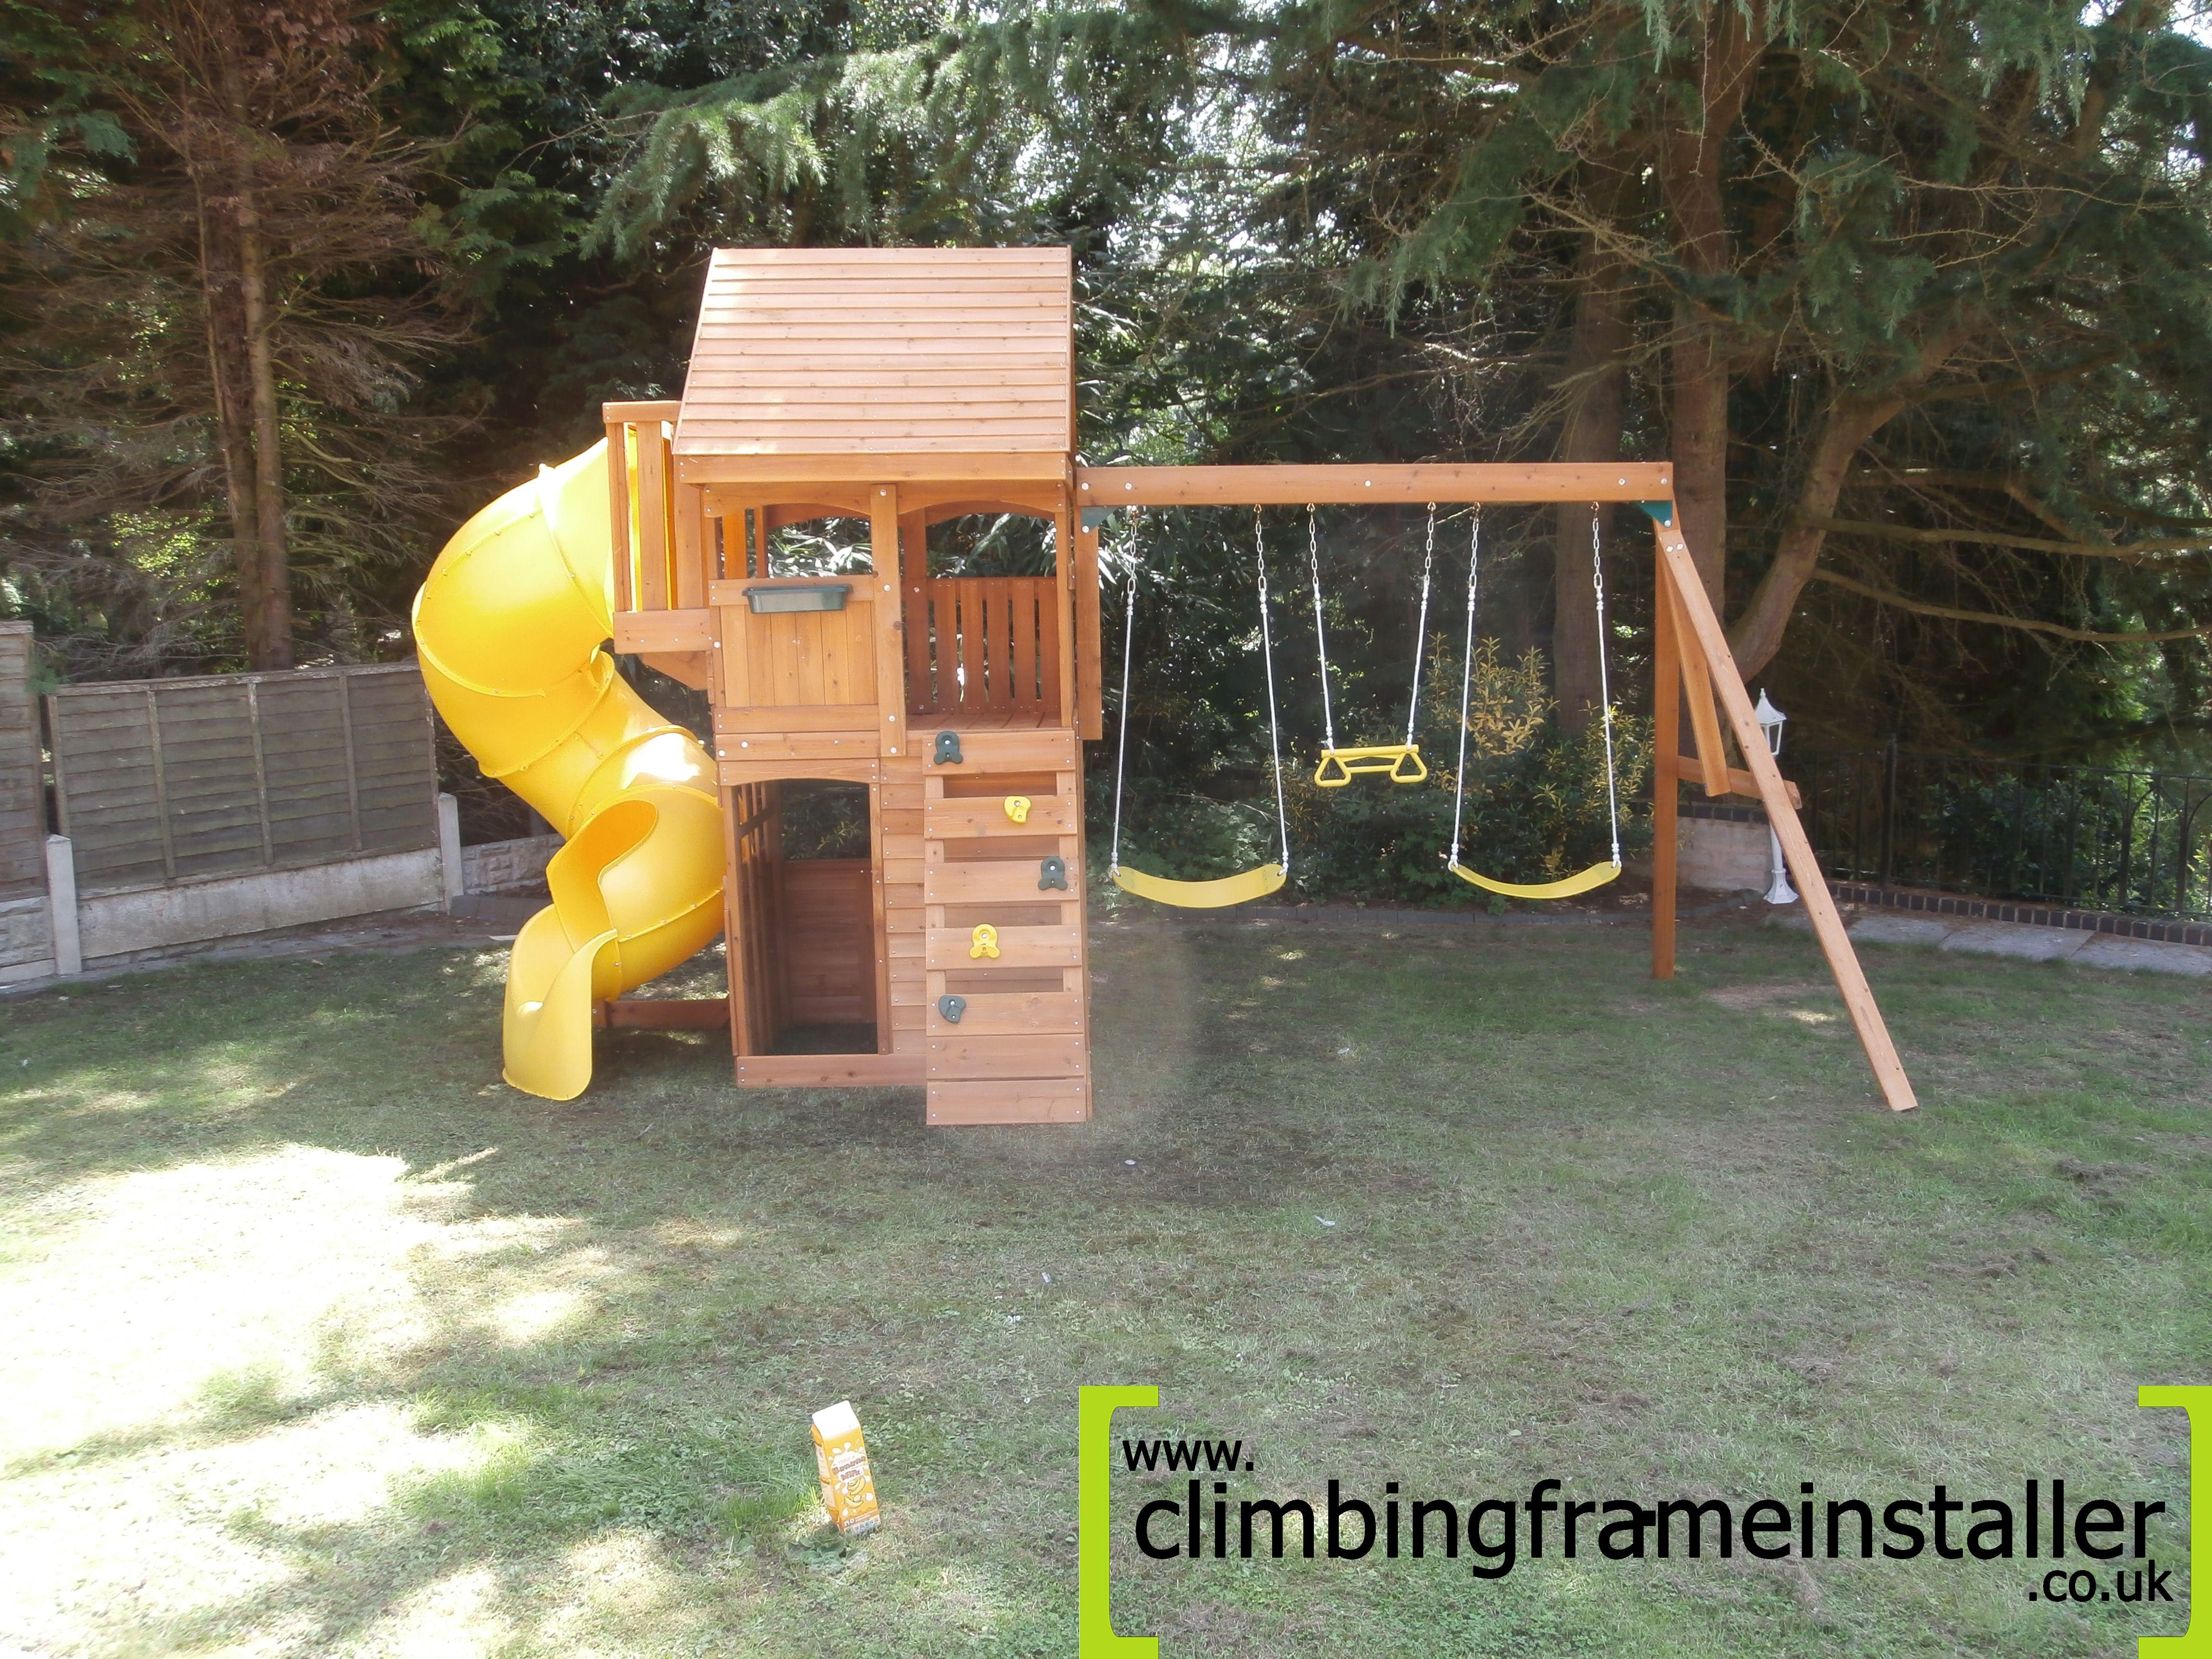 The Grandview Cedar Climbing Frame Climbing Frame Installer